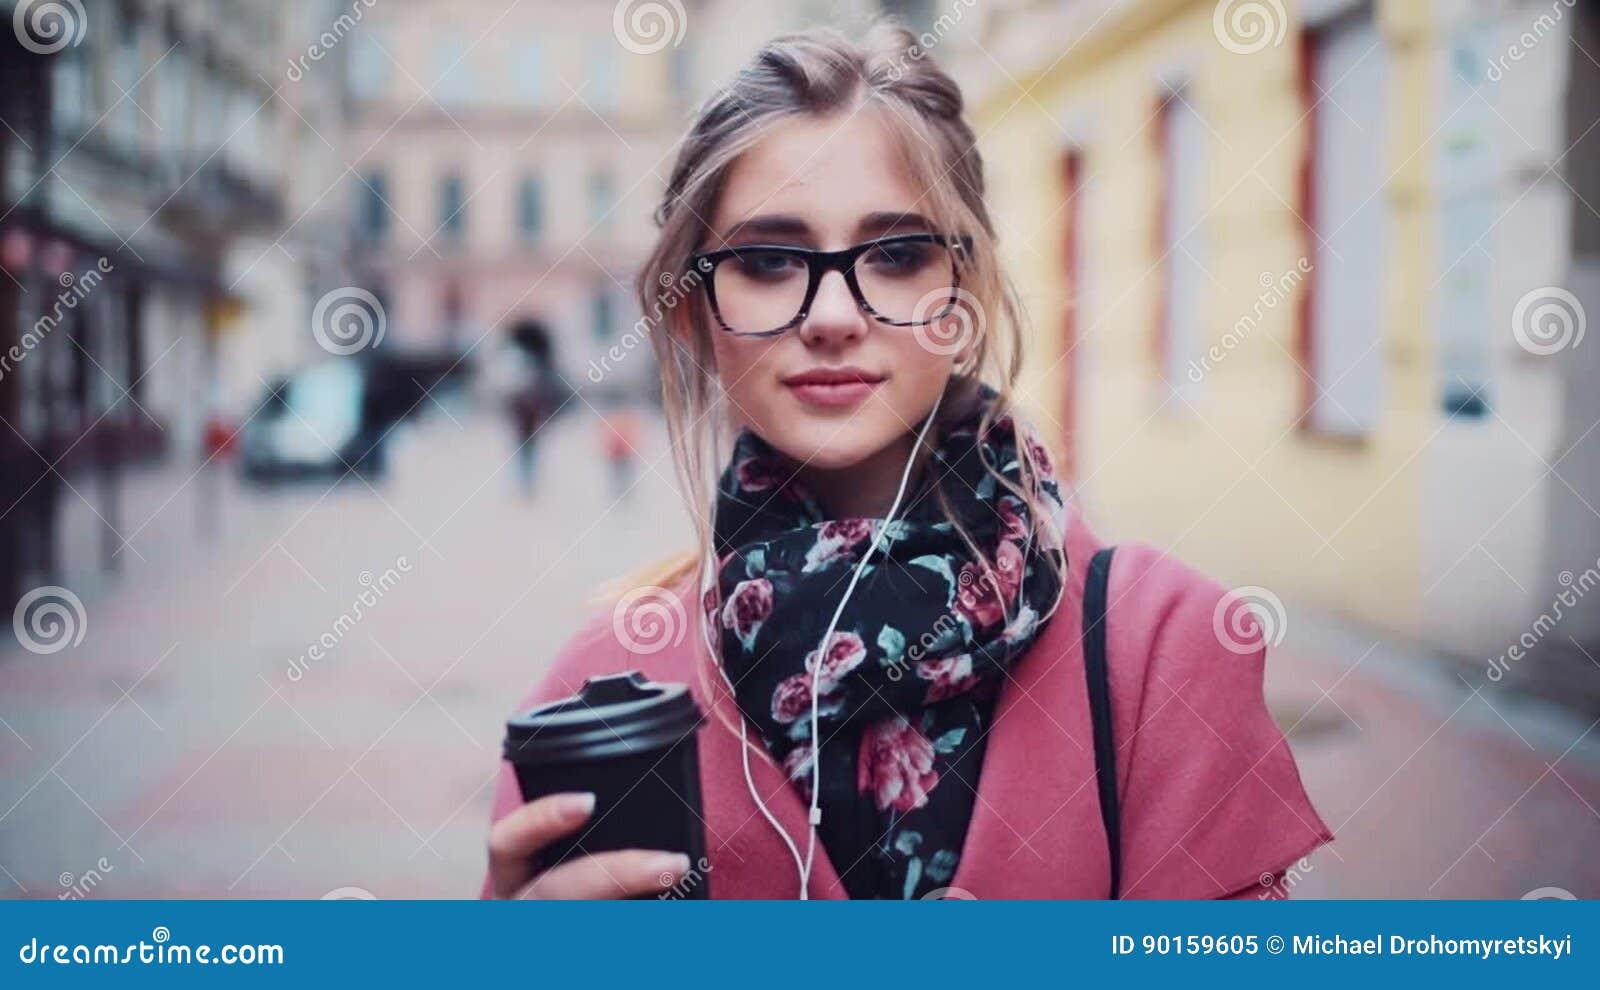 movies-sexy-nerd-woman-indian-actress-fake